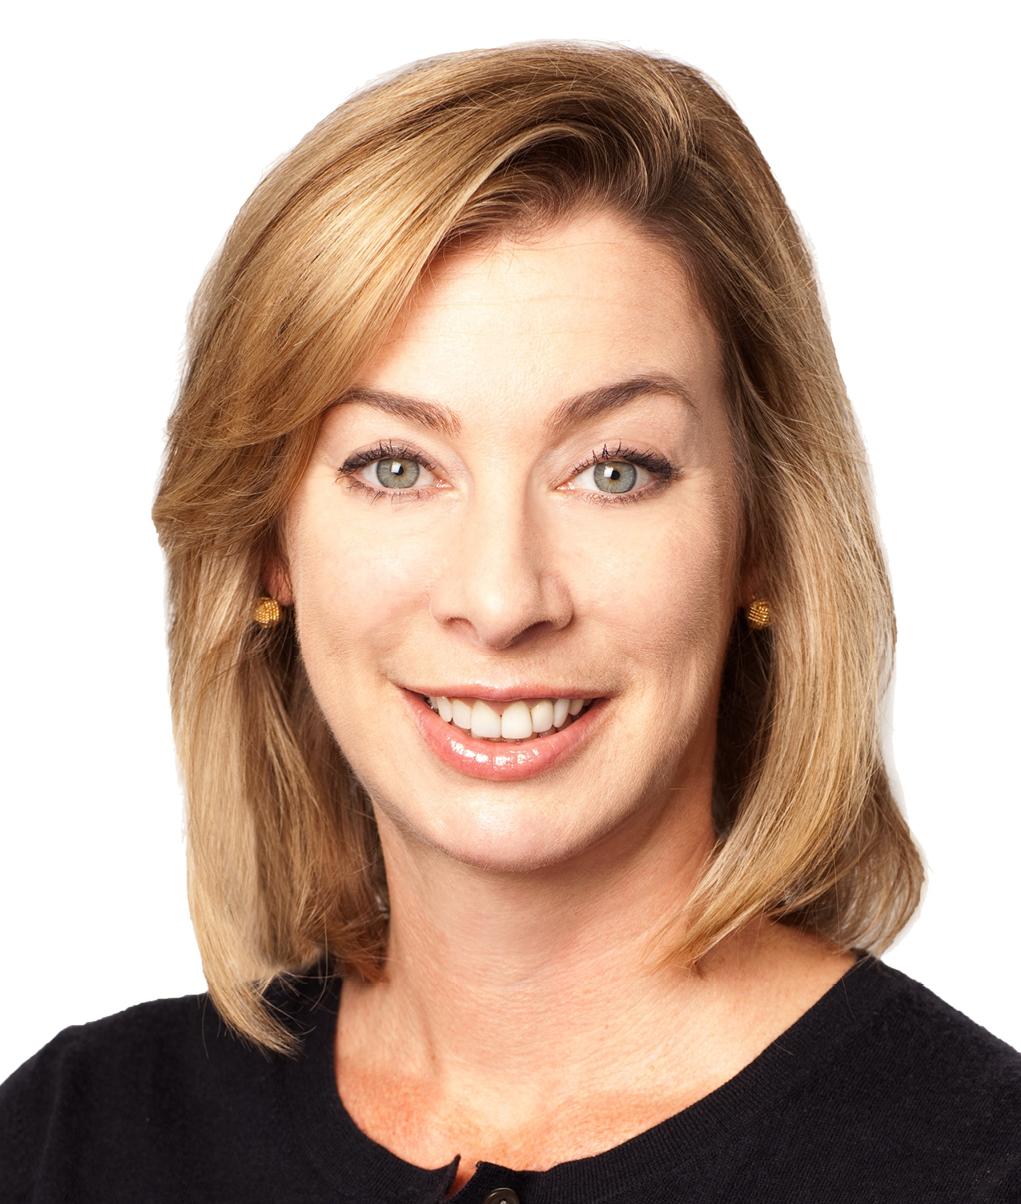 Dr. Jessica Grossman